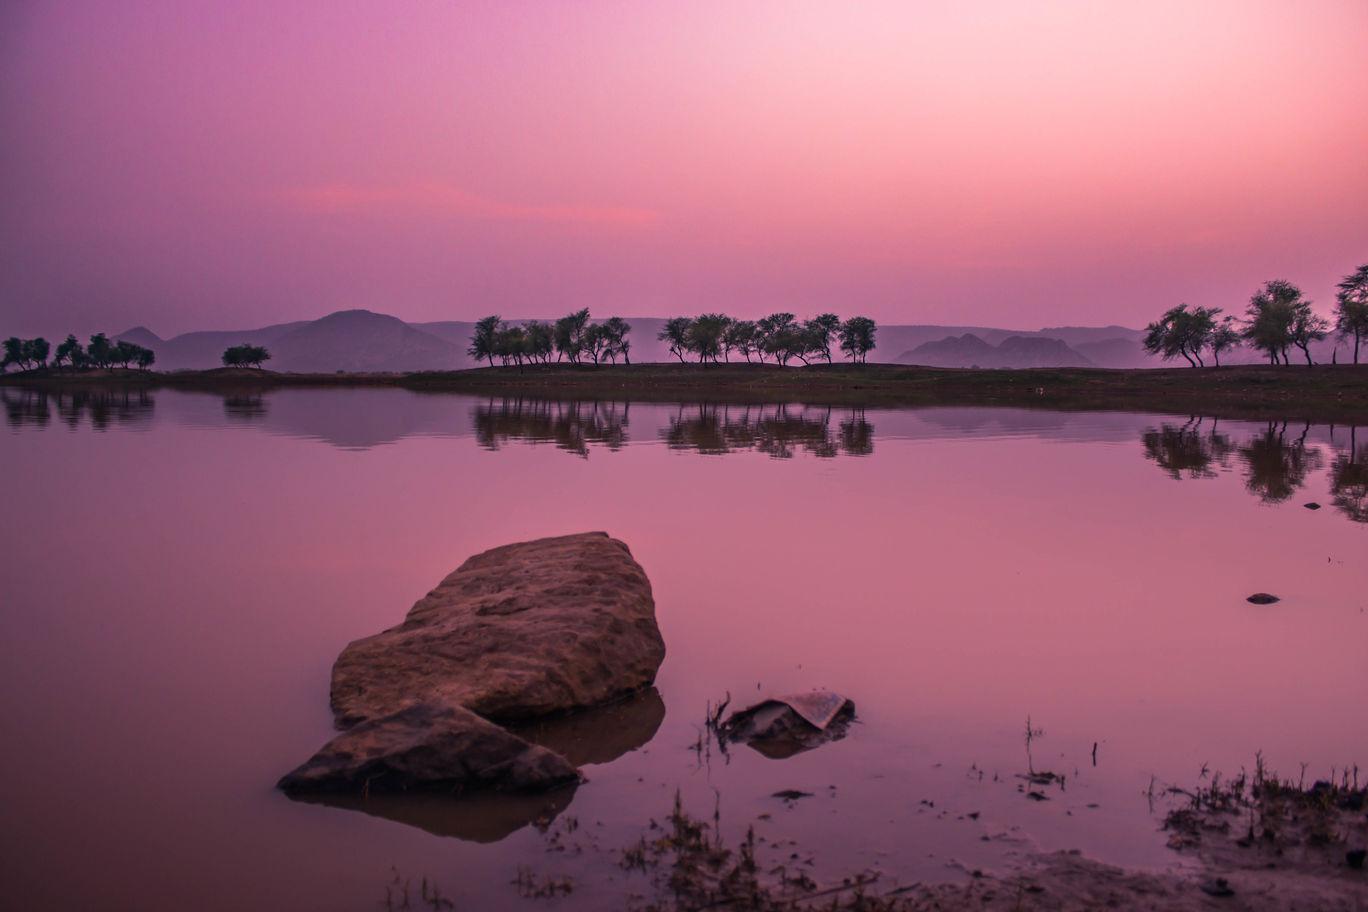 Photo of Jaisamand Lake By Piyush Agarwal